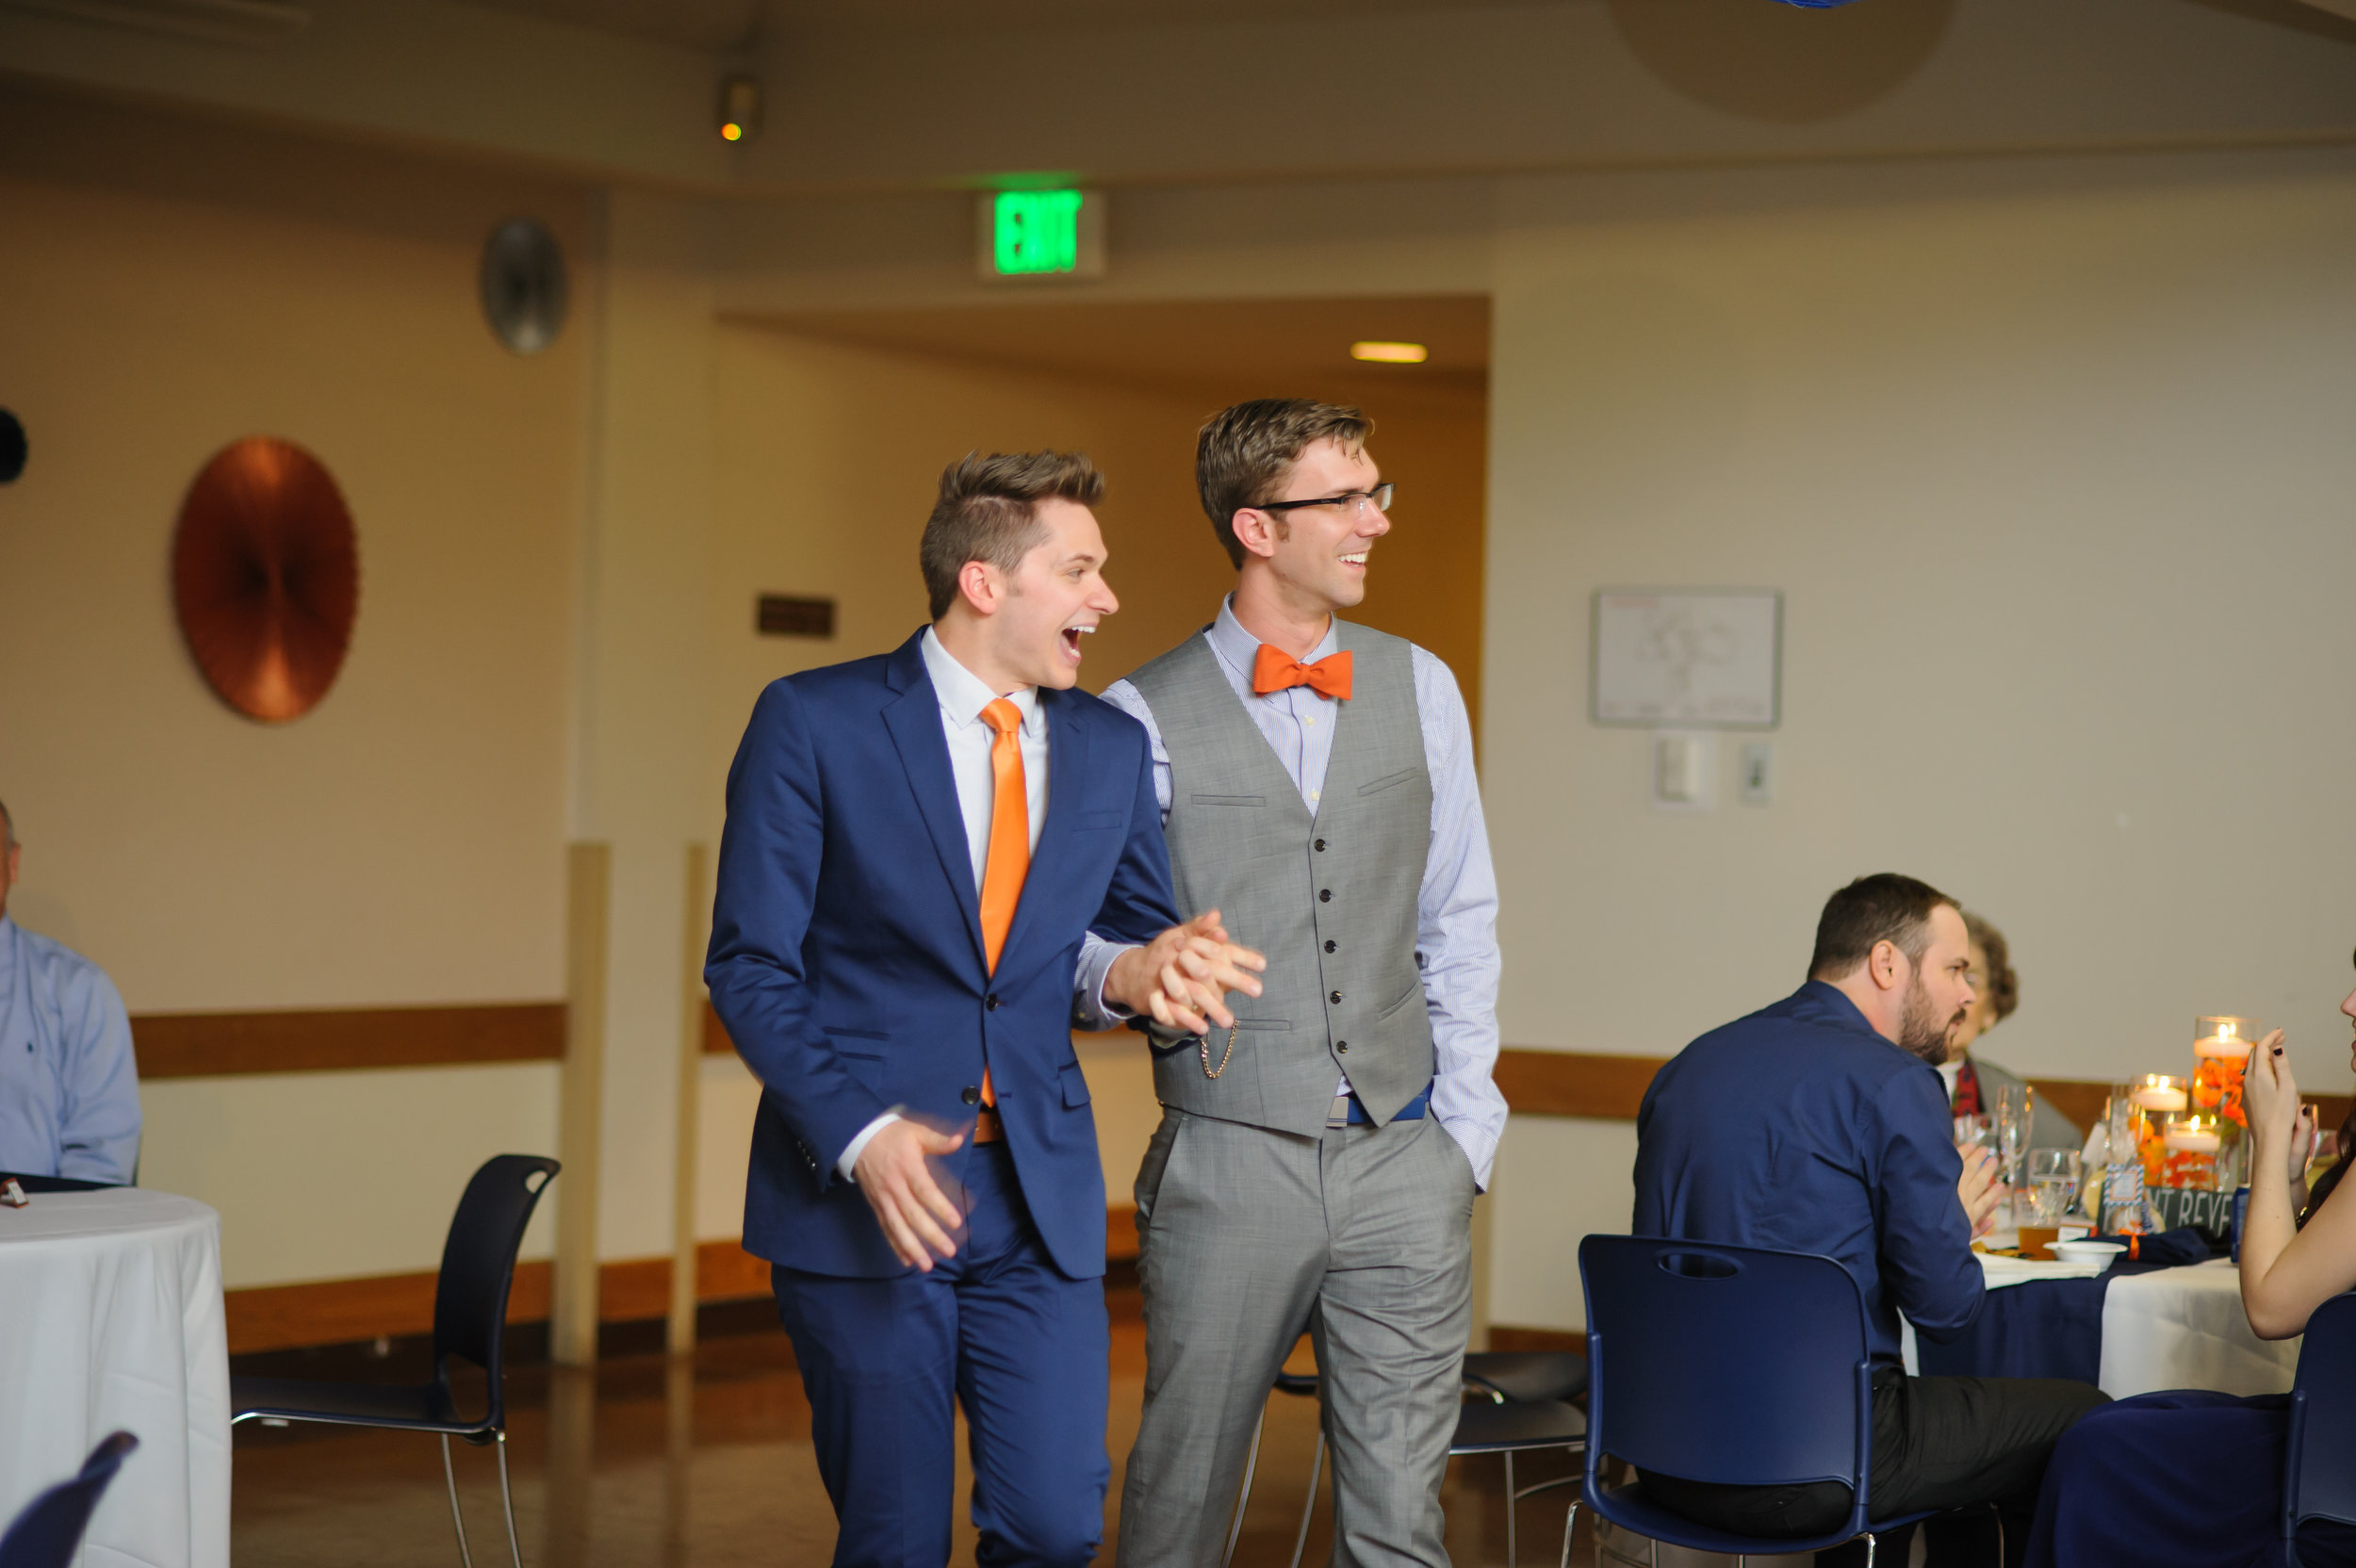 josh-parker-044-same-sex-sacramento-wedding-photographer-katherine-nicole-photography.JPG